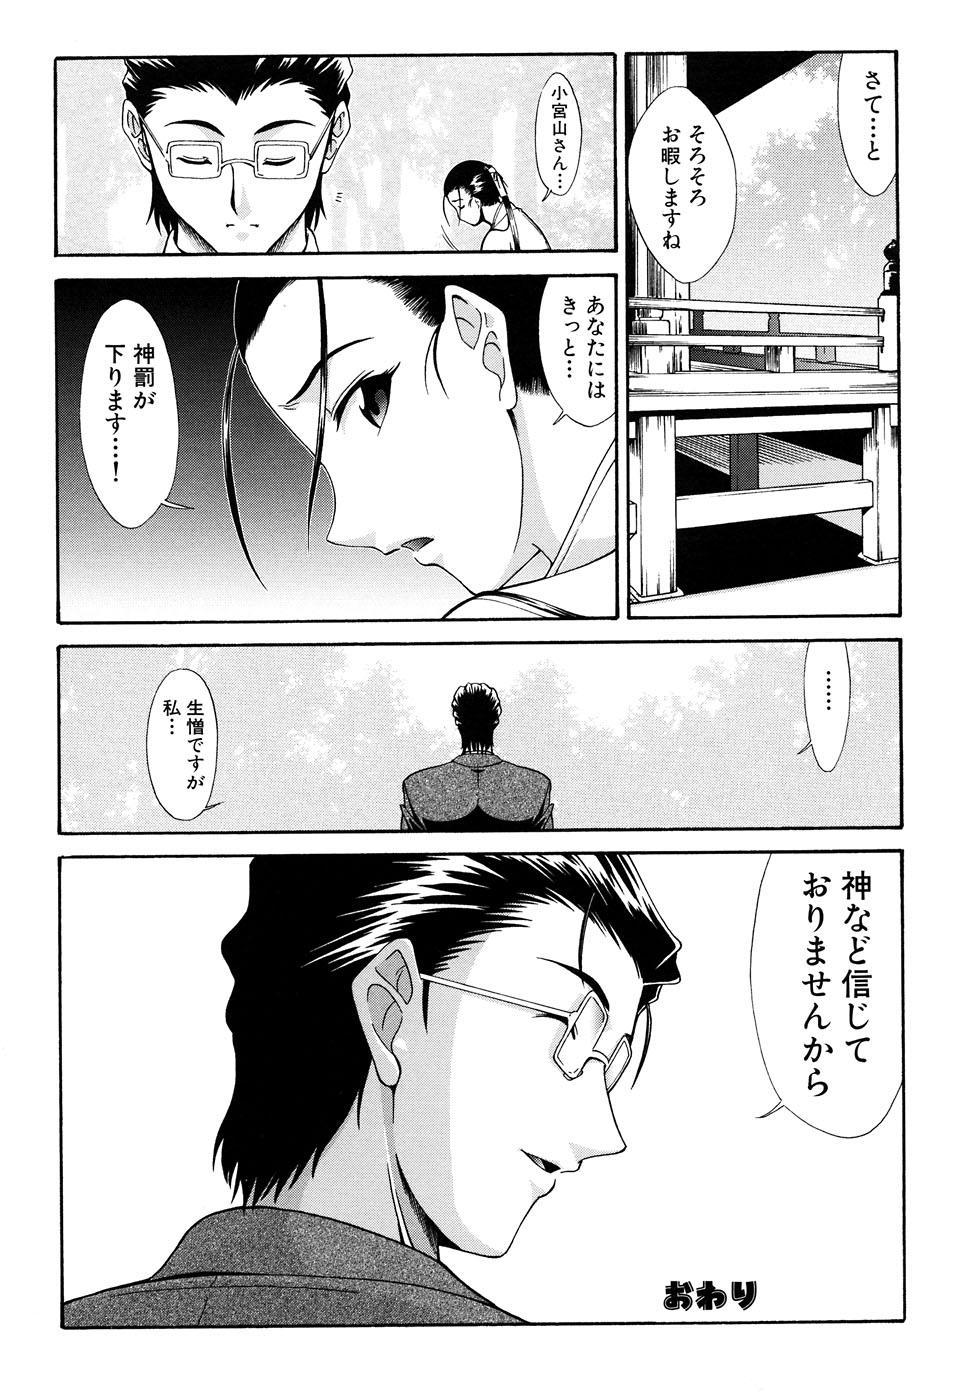 Fechikko VS Series ROUND.2 Miko San VS Maid San 24